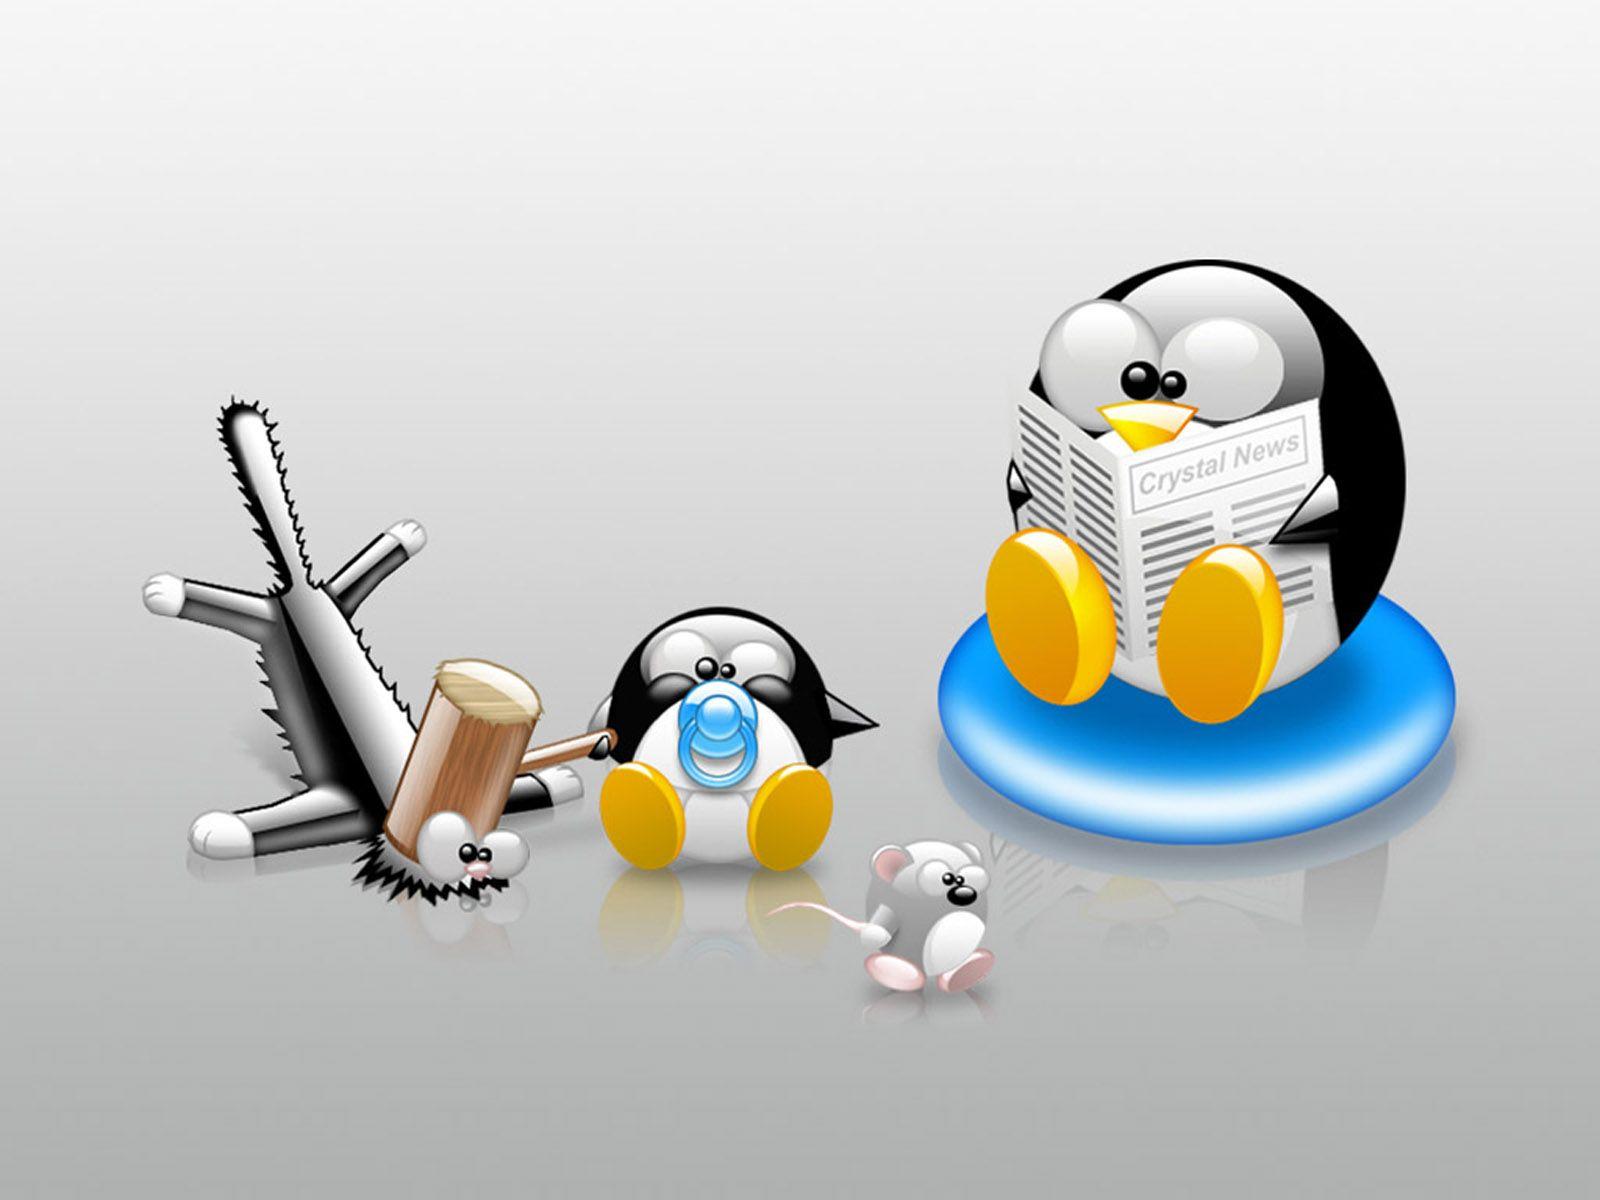 funny linux wallpaper free computer desktop